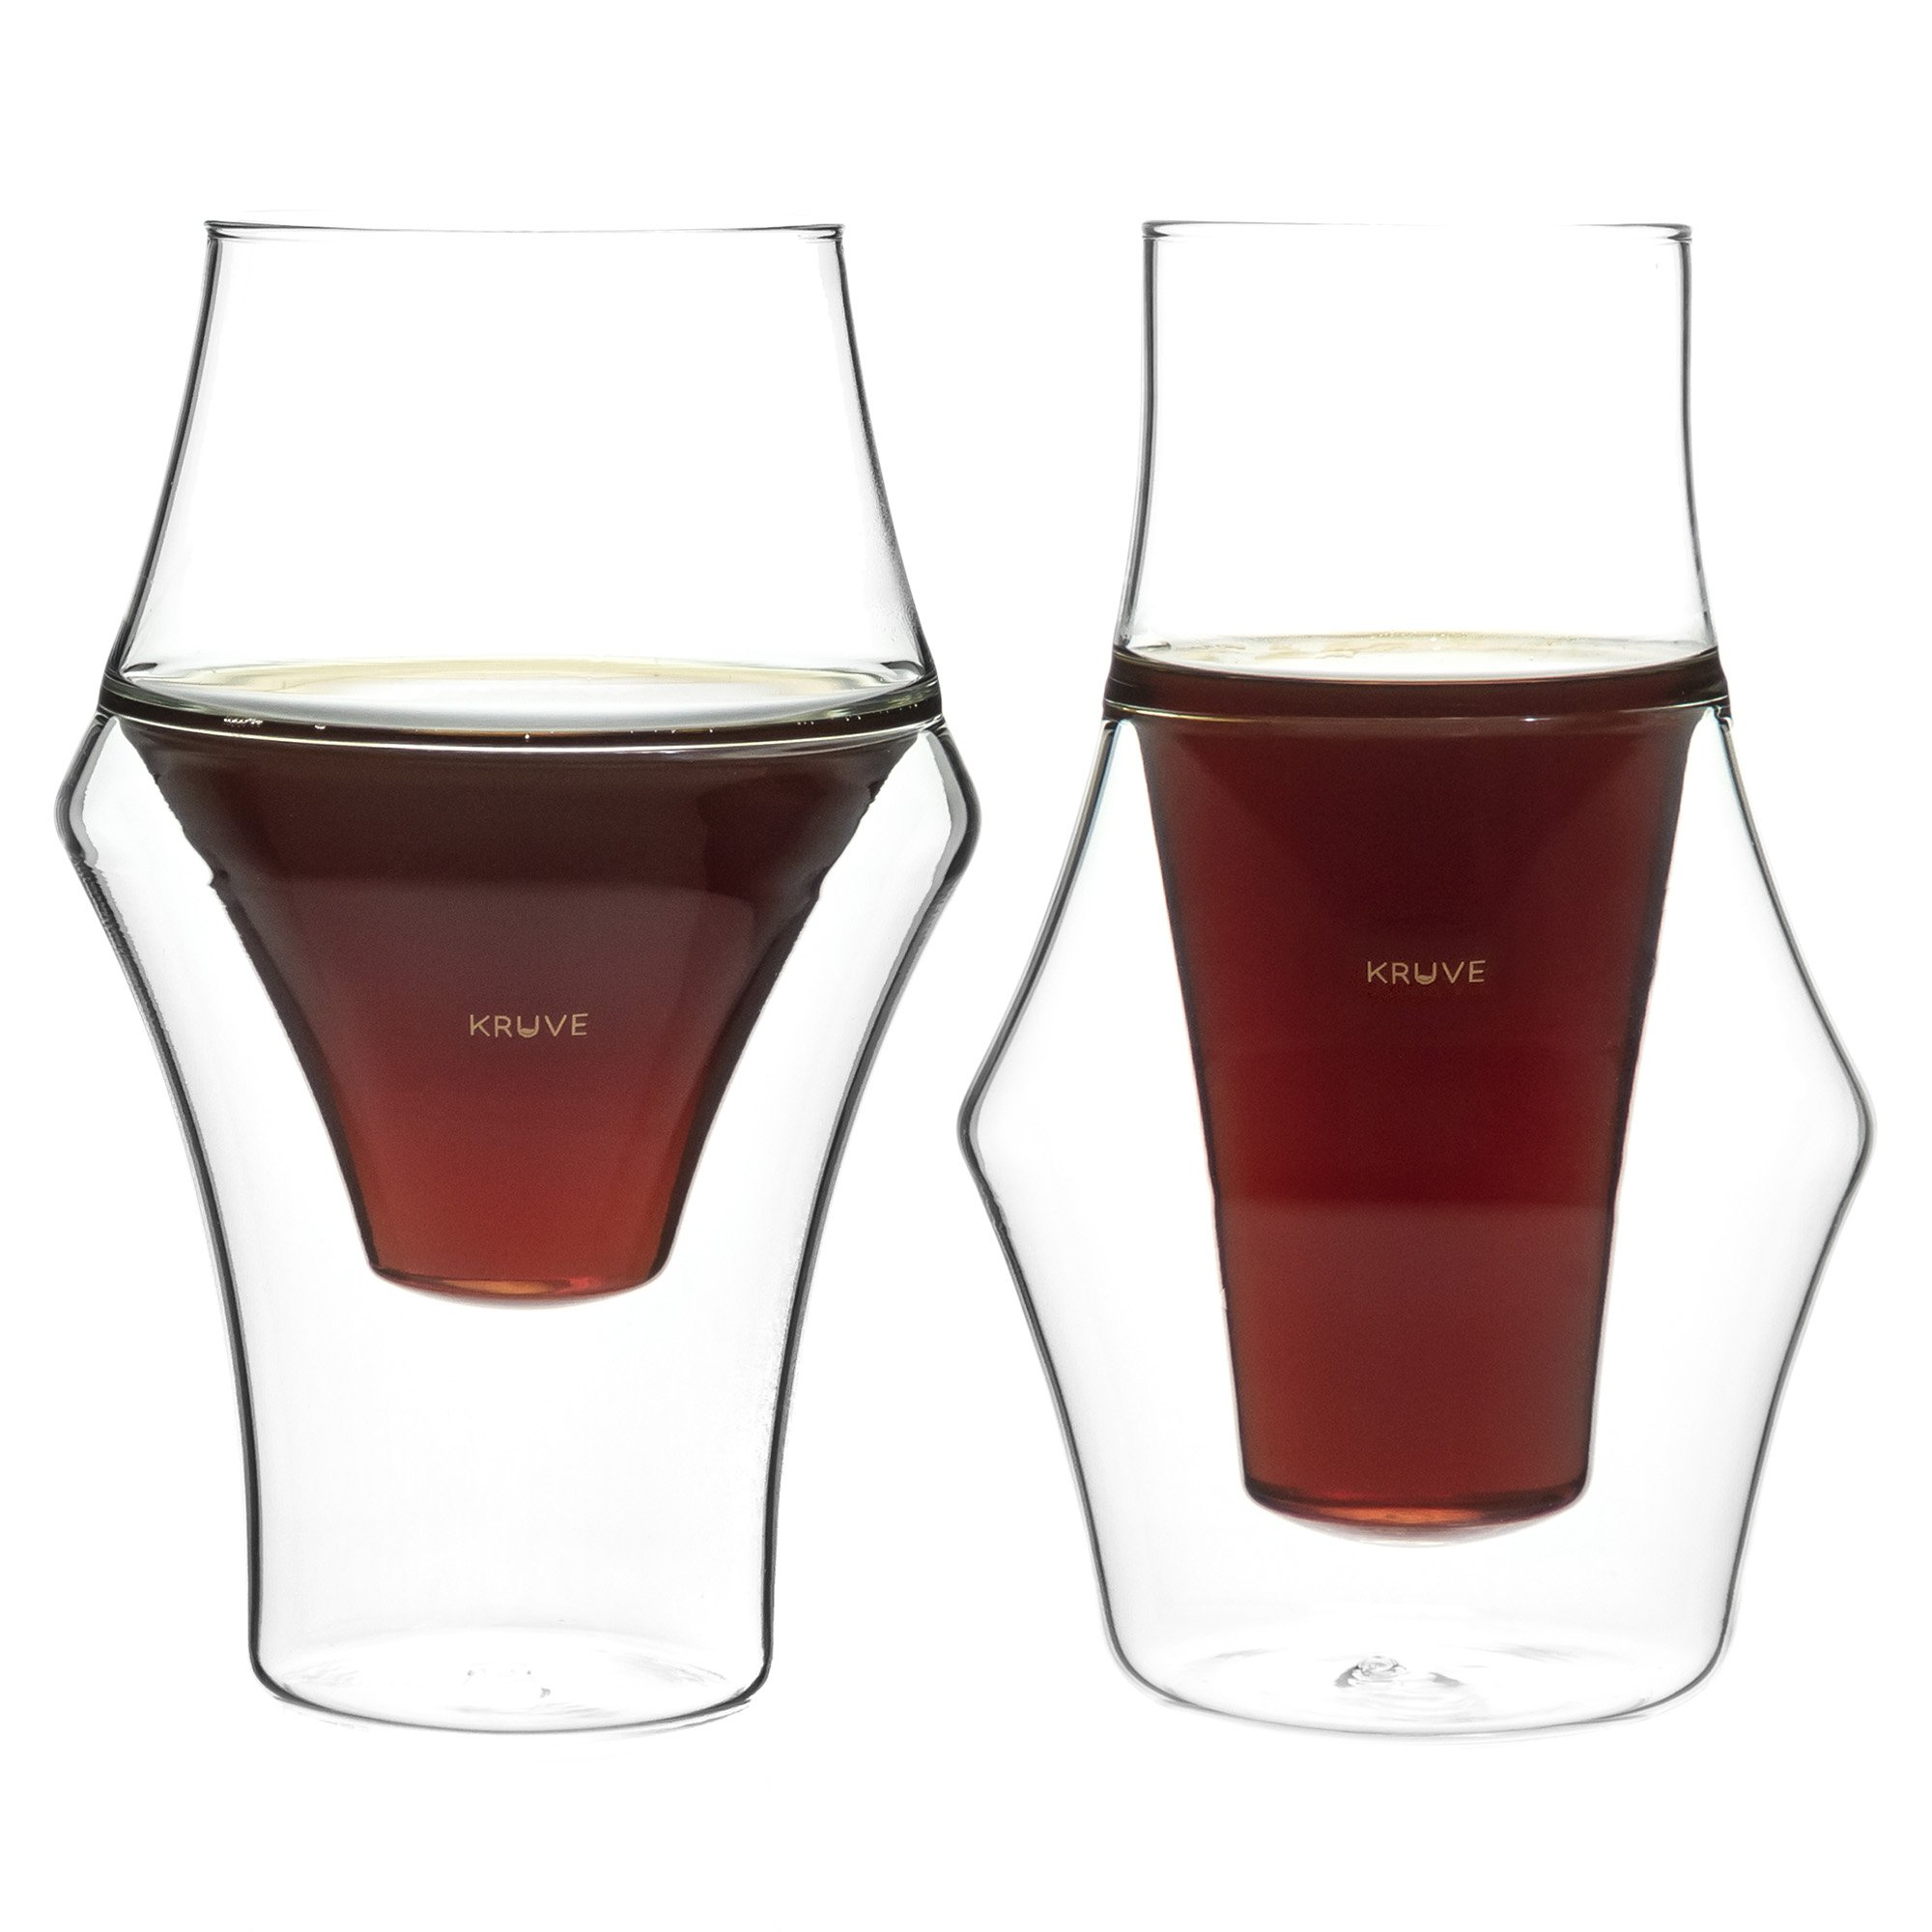 KRUVE EQ Glasses &PROPEL Espresso Glasses Tasting Cup Enhance Sensory Experience Enhanced Aroma Balanced Flavour Dishwasher Safe